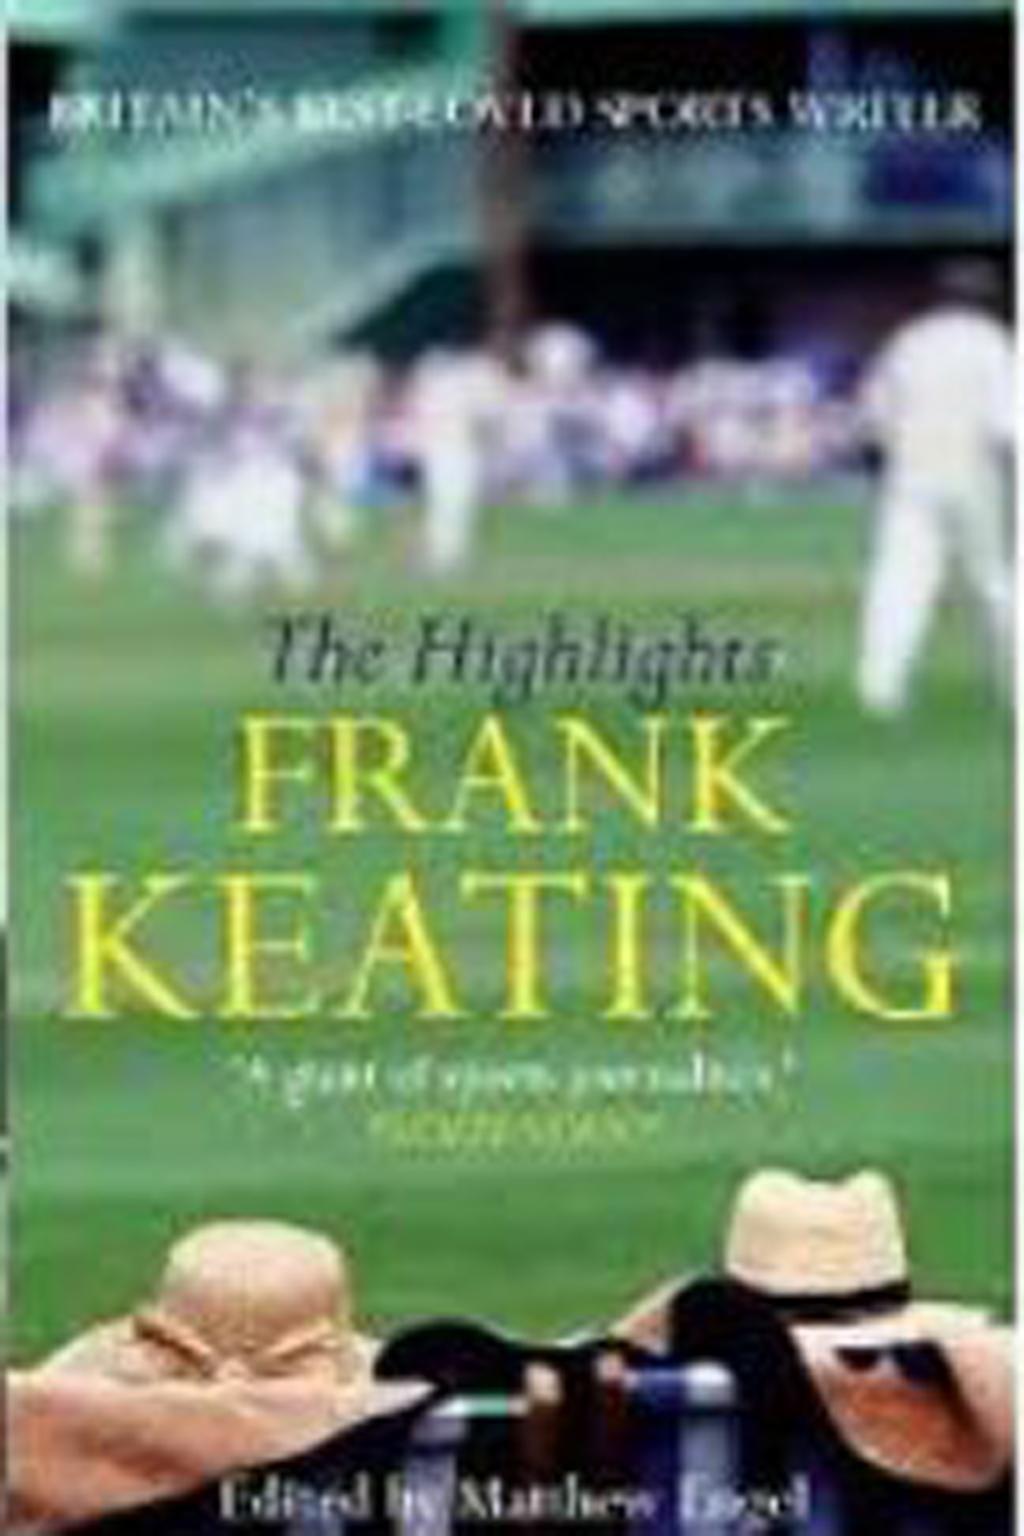 Frank Keating – The Highlights edited by Matthew Engel